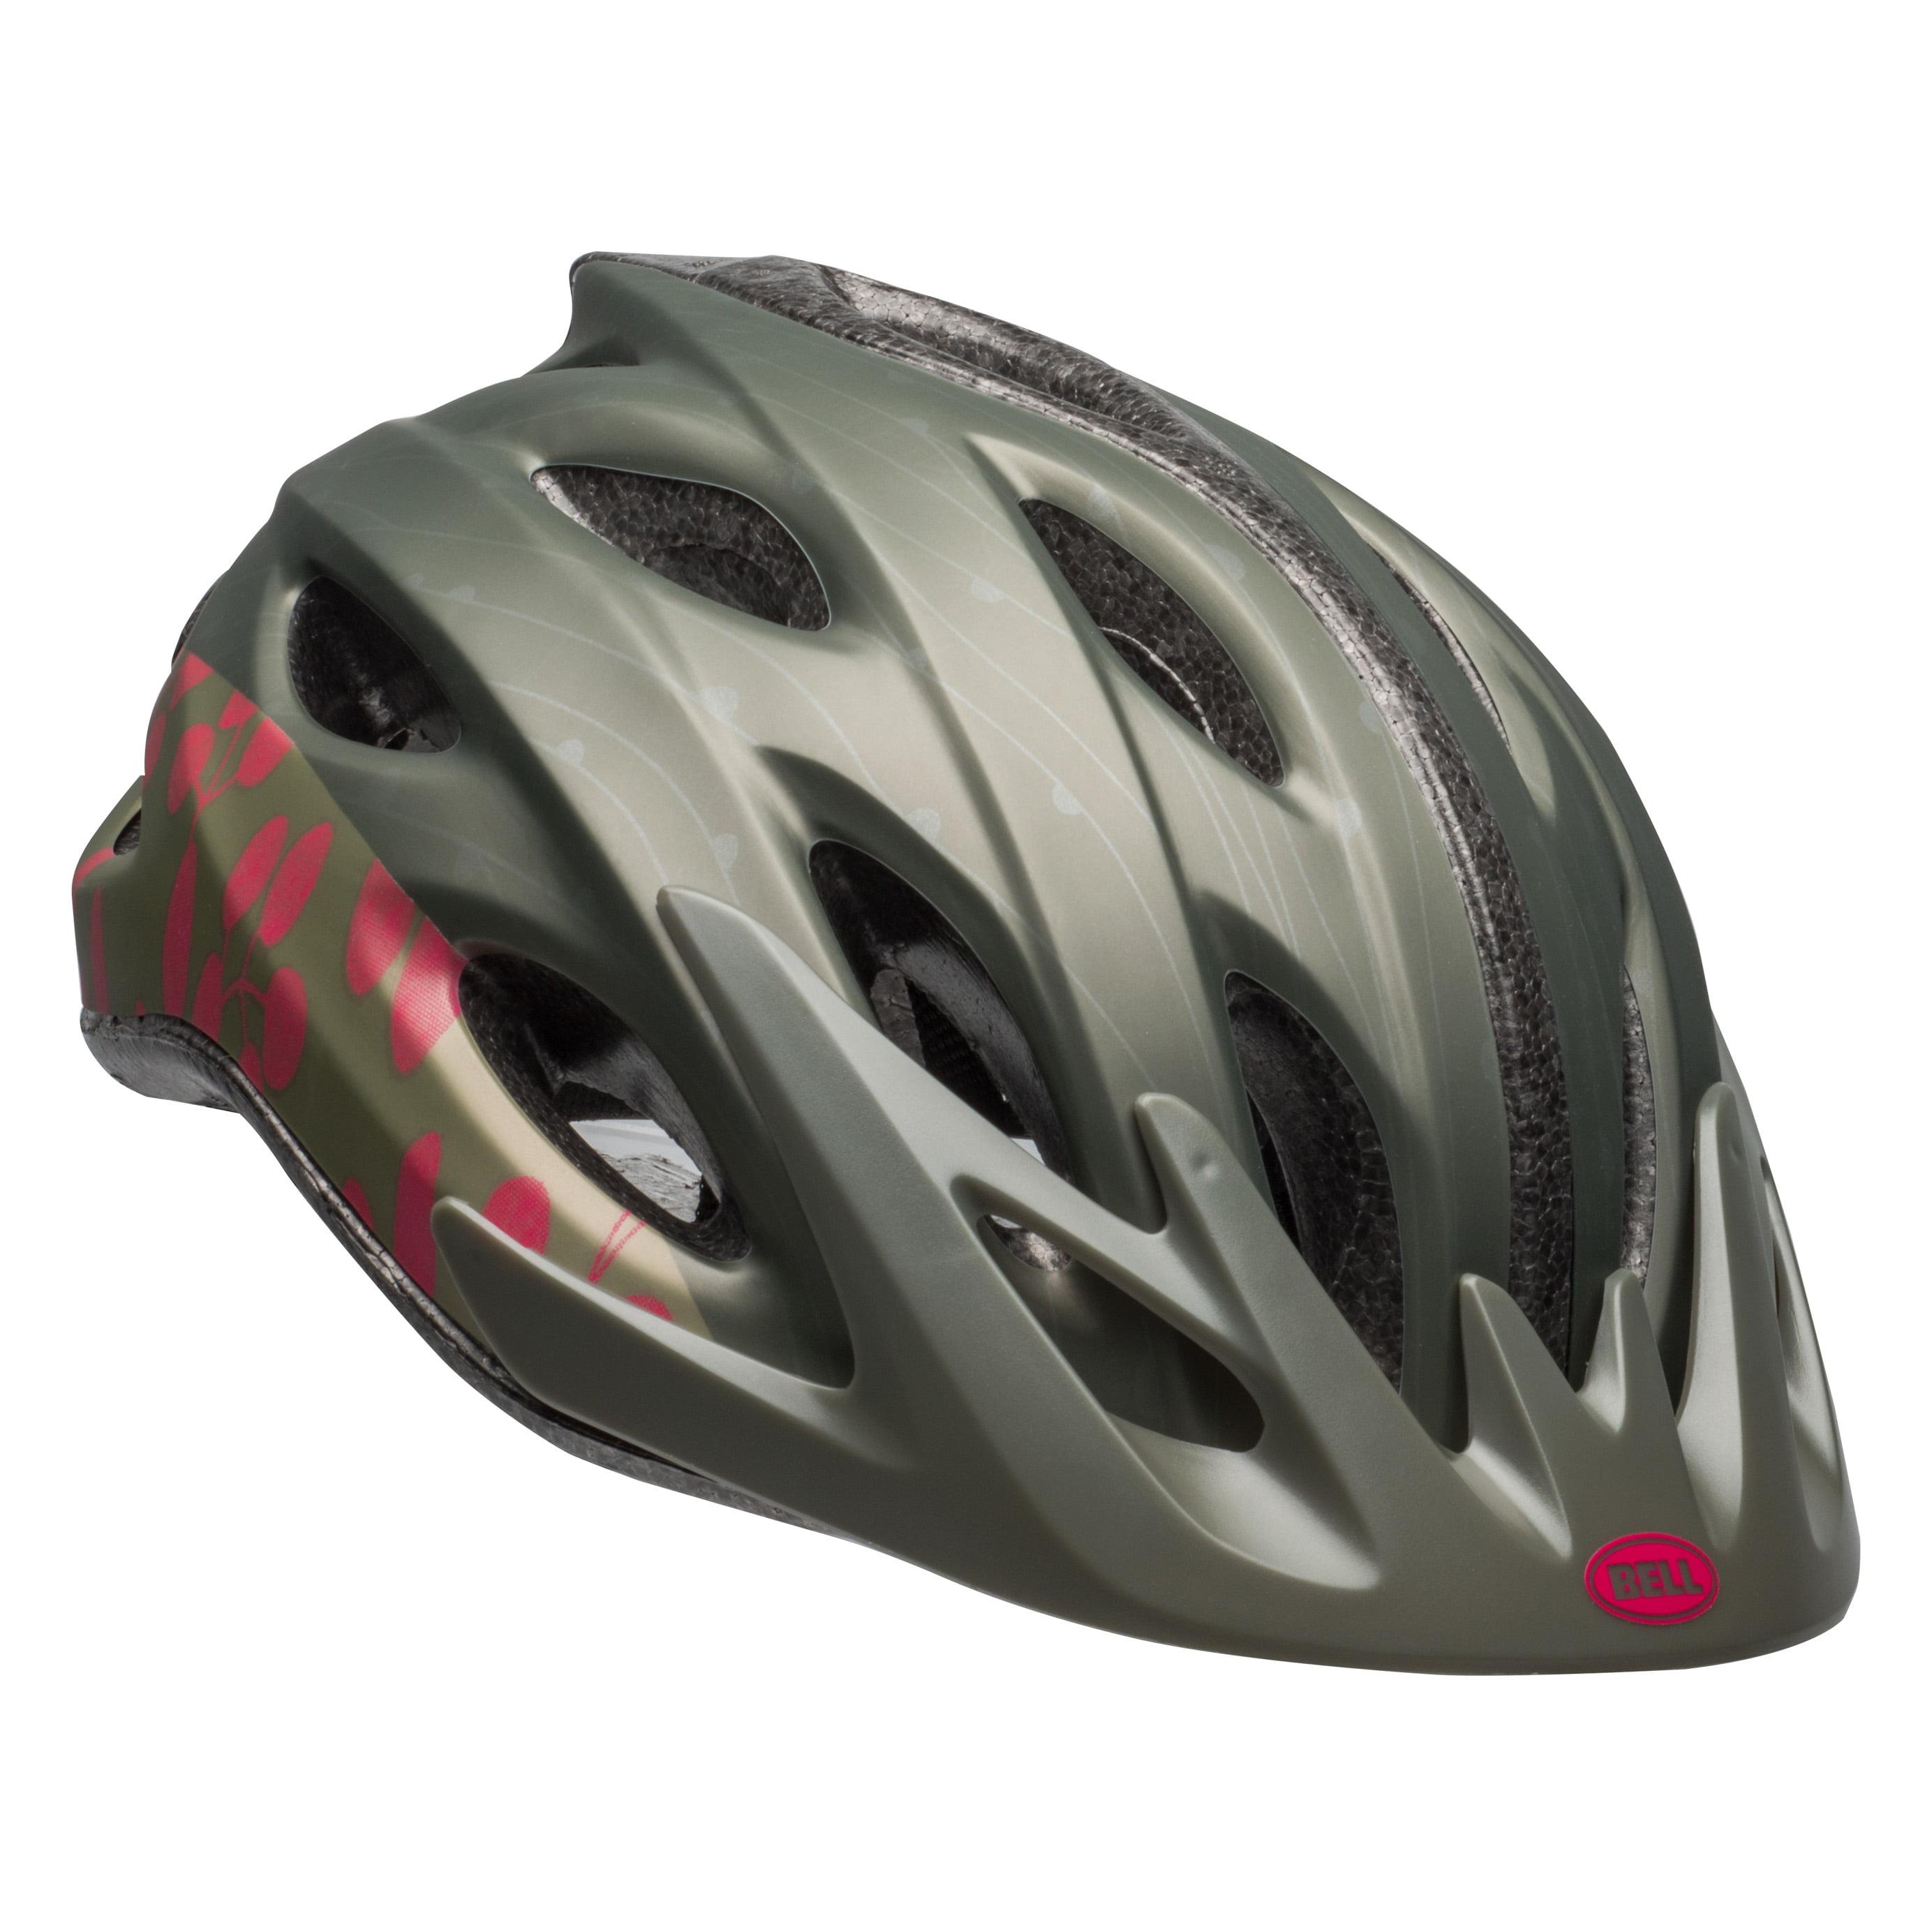 Bell Sports Women's Berry Adult Bike Helmet, Tree of Life